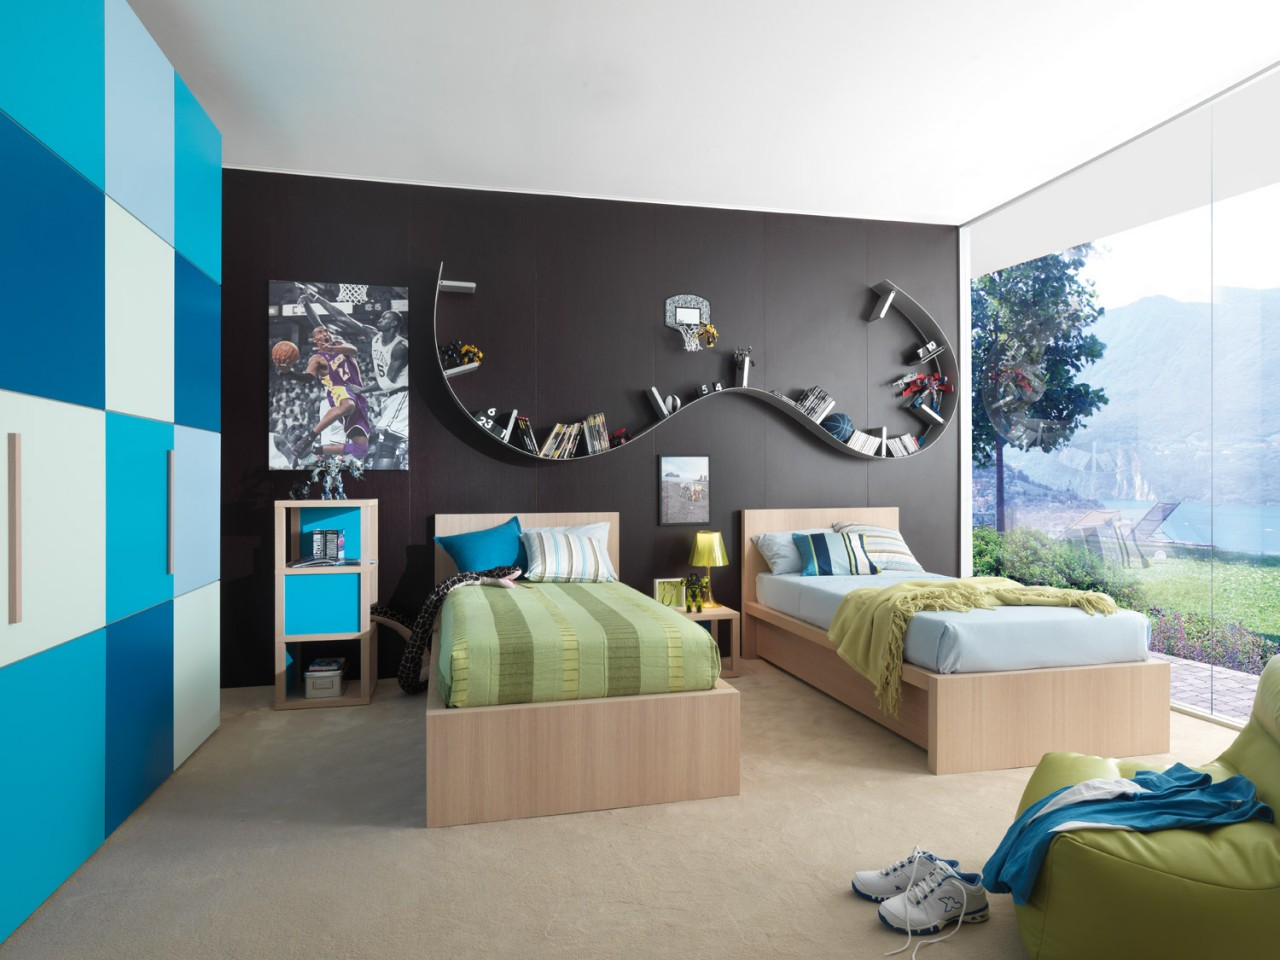 Fotos de dormitorios juveniles para dos chicos - Fotos de cuartos juveniles ...